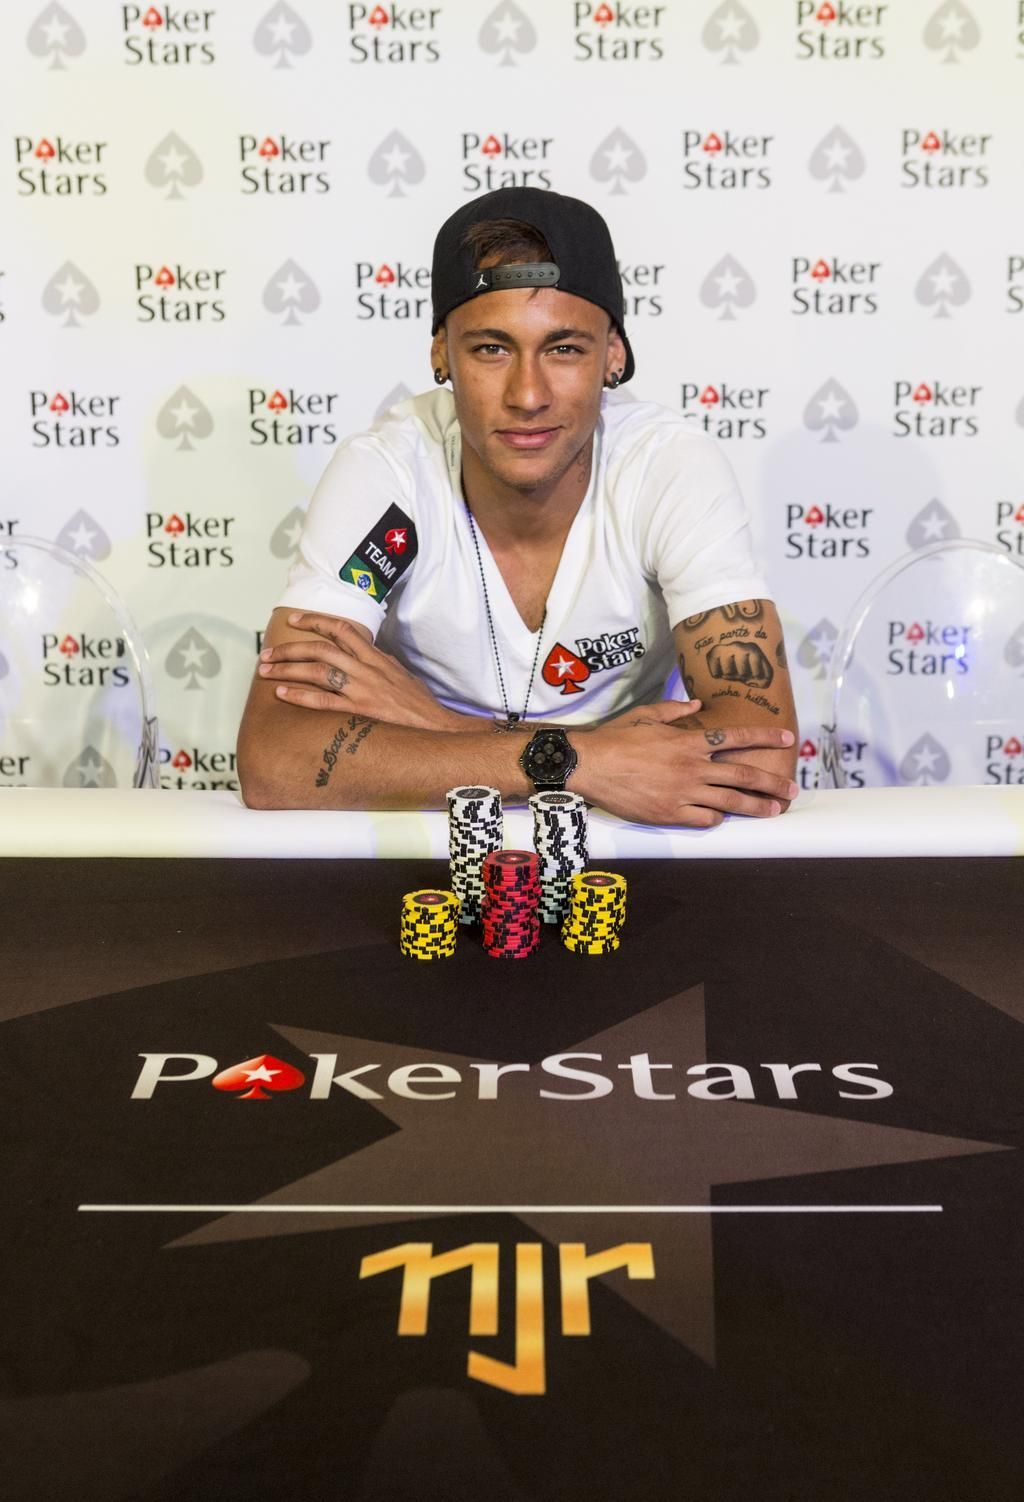 Pin By Alanys Silva On Neymito Neymar Jr Neymar Poker